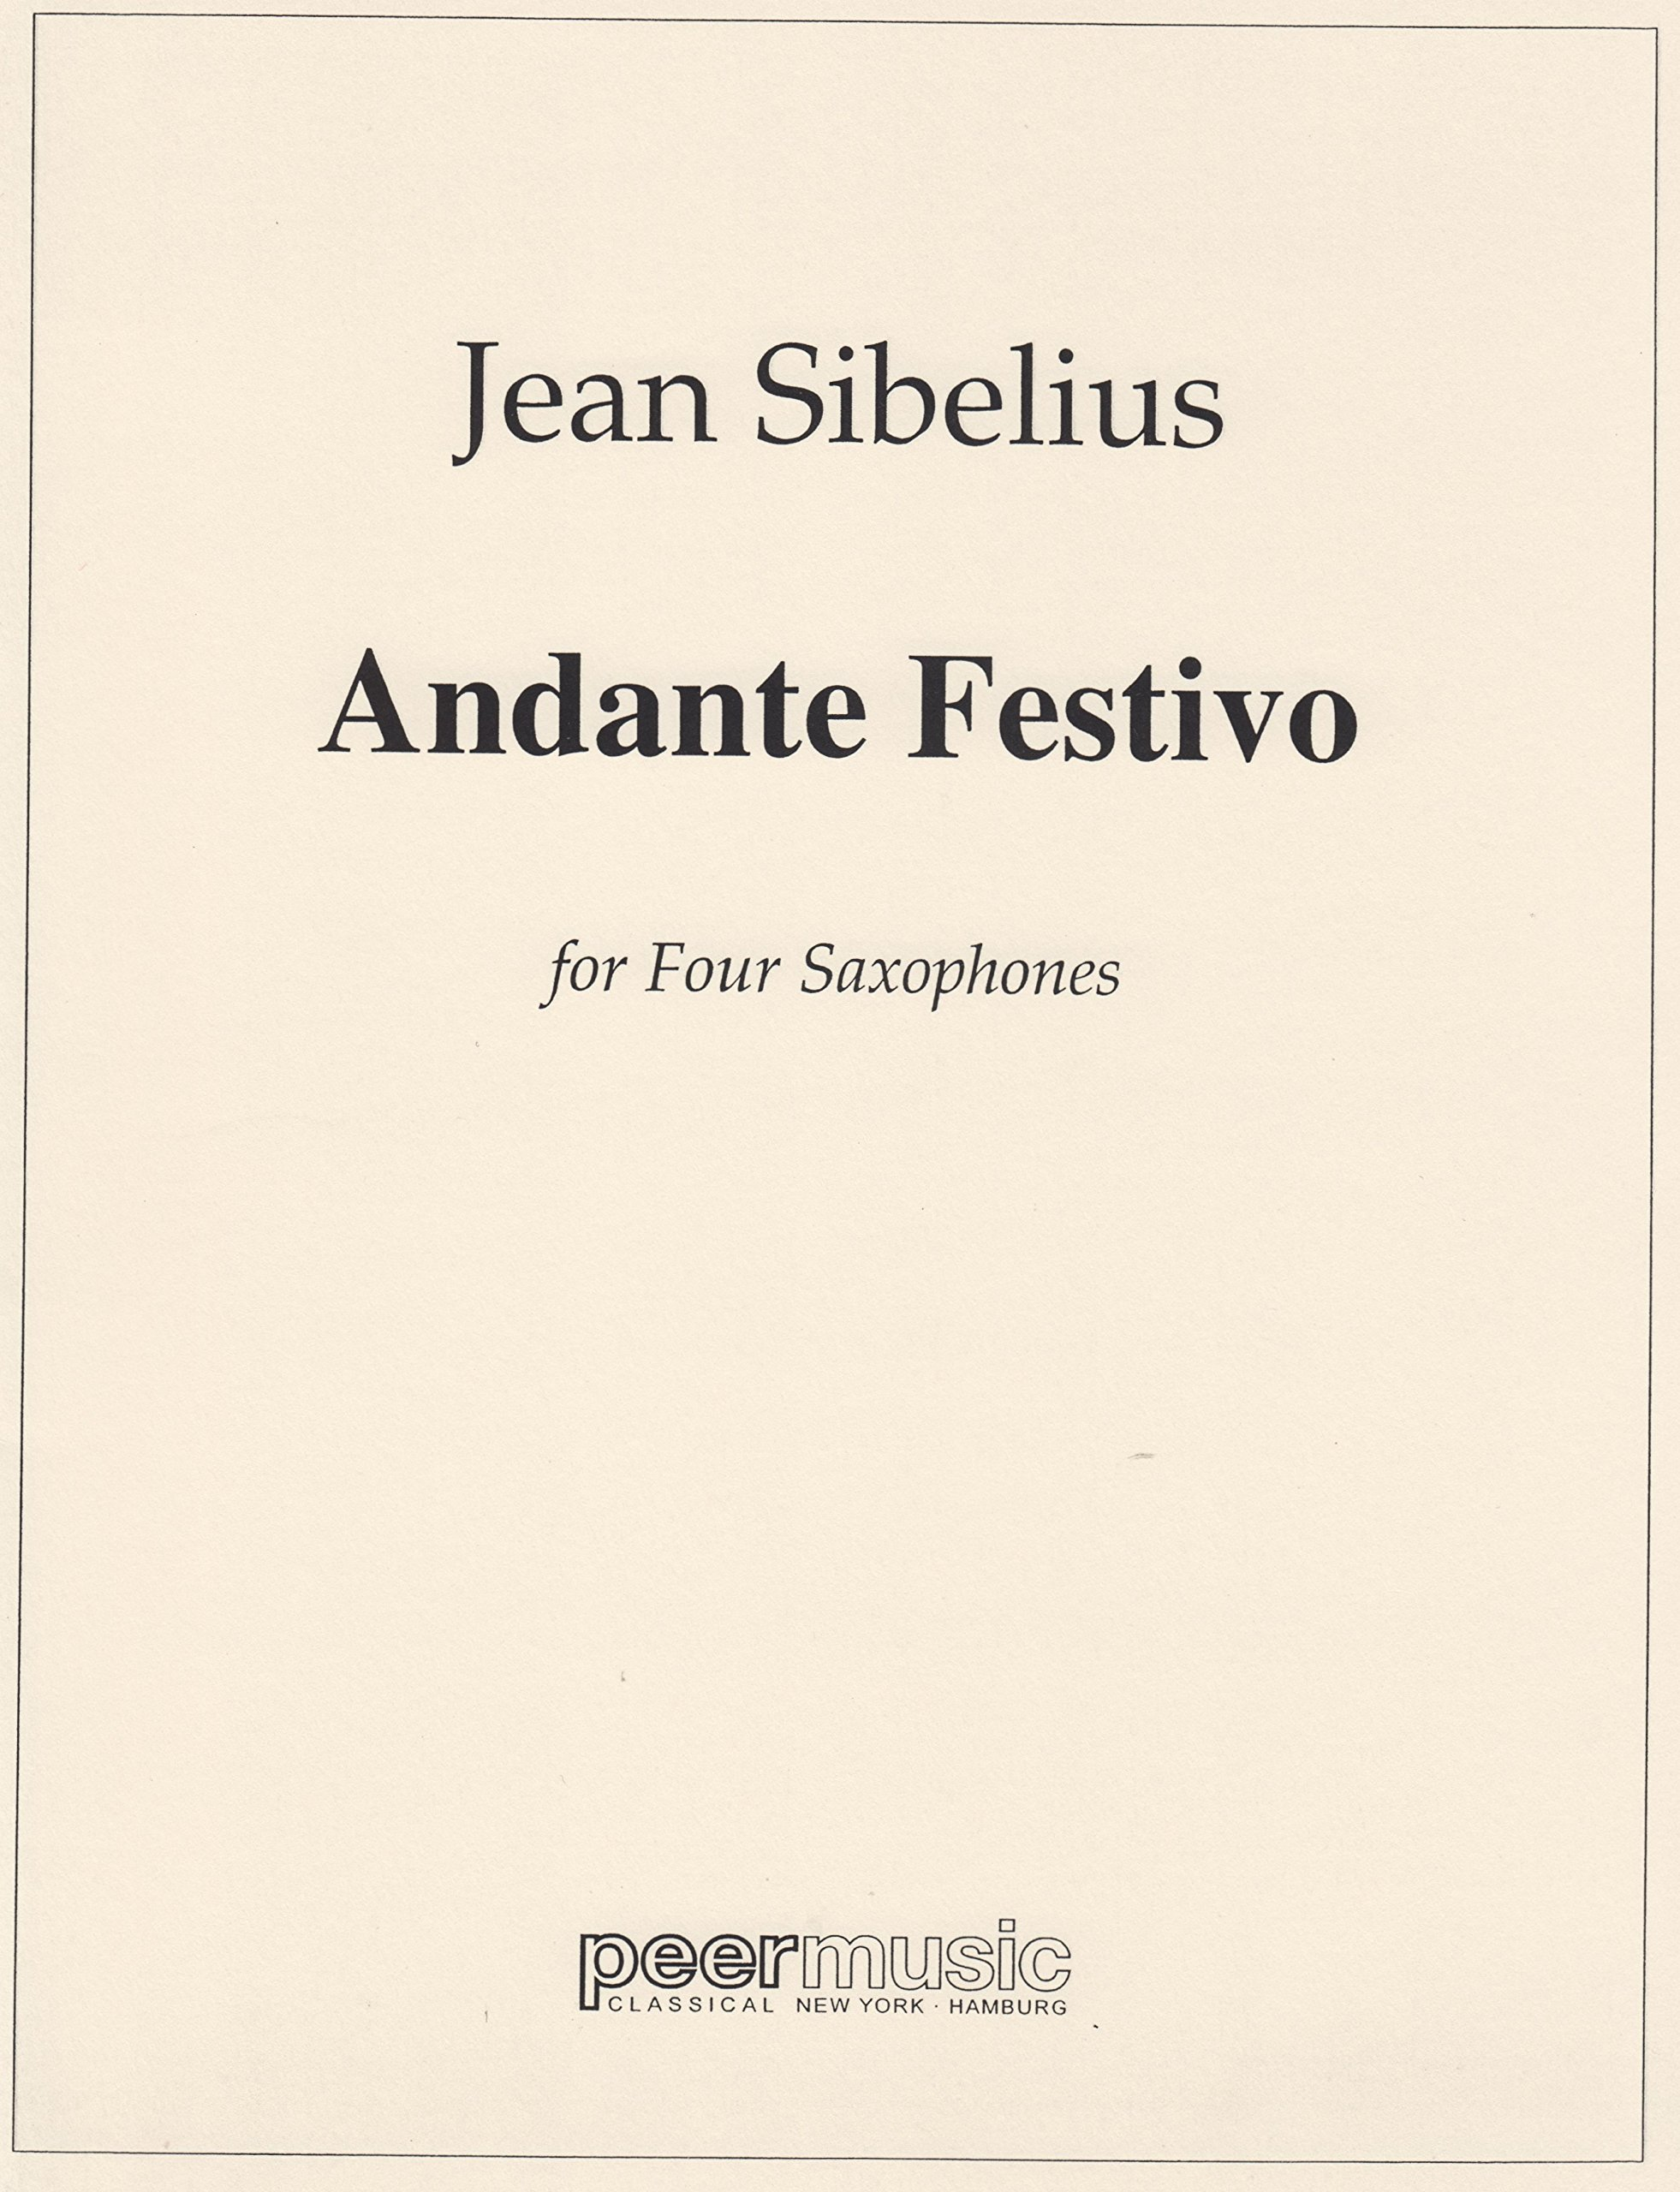 Andante Festivo for Saxophone Quartet by Jean Sibelius